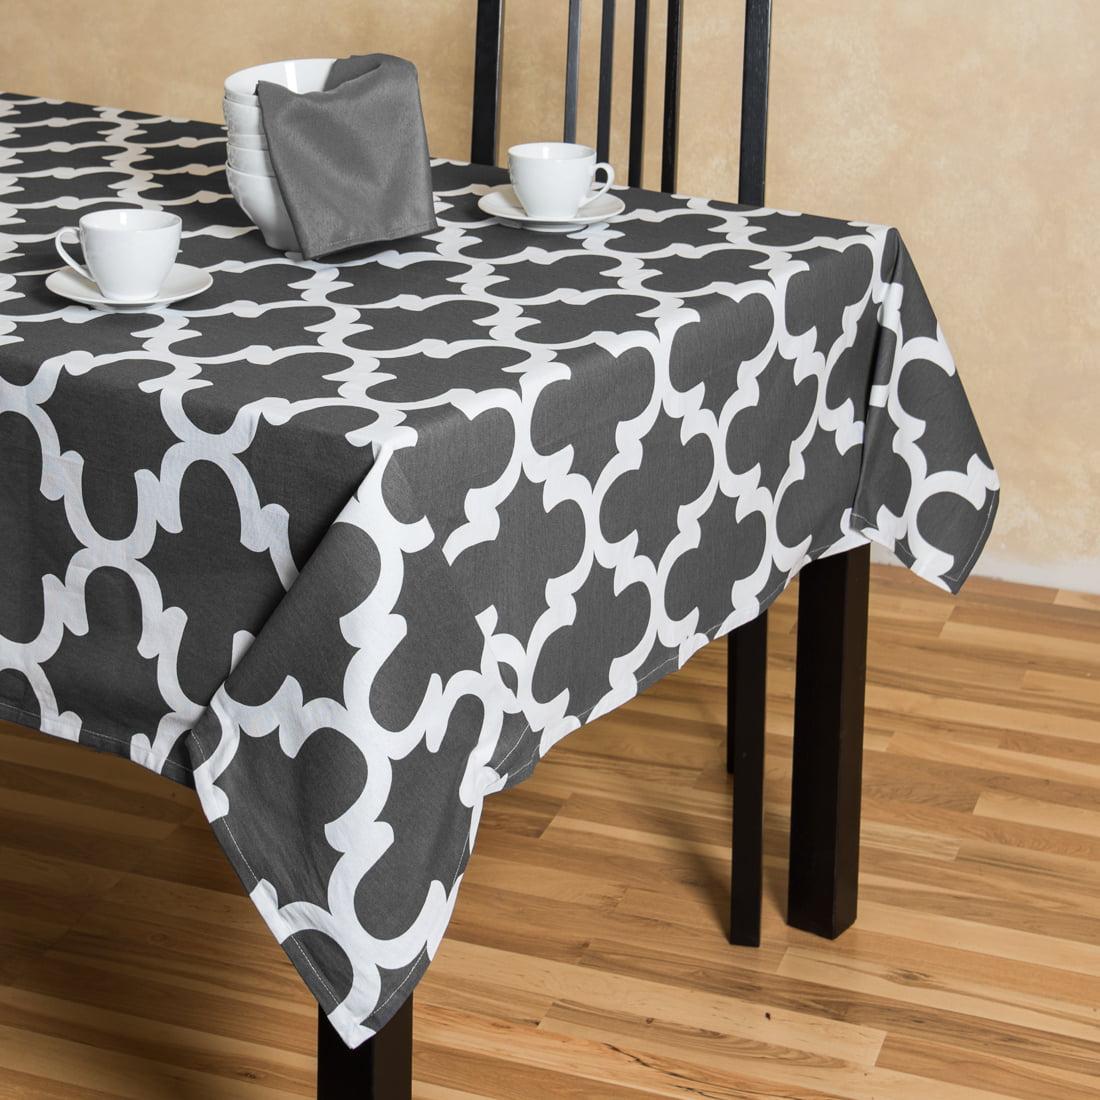 Trellis Rectangular Cotton Tablecloth Charcoal U0026amp; White   Walmart.com